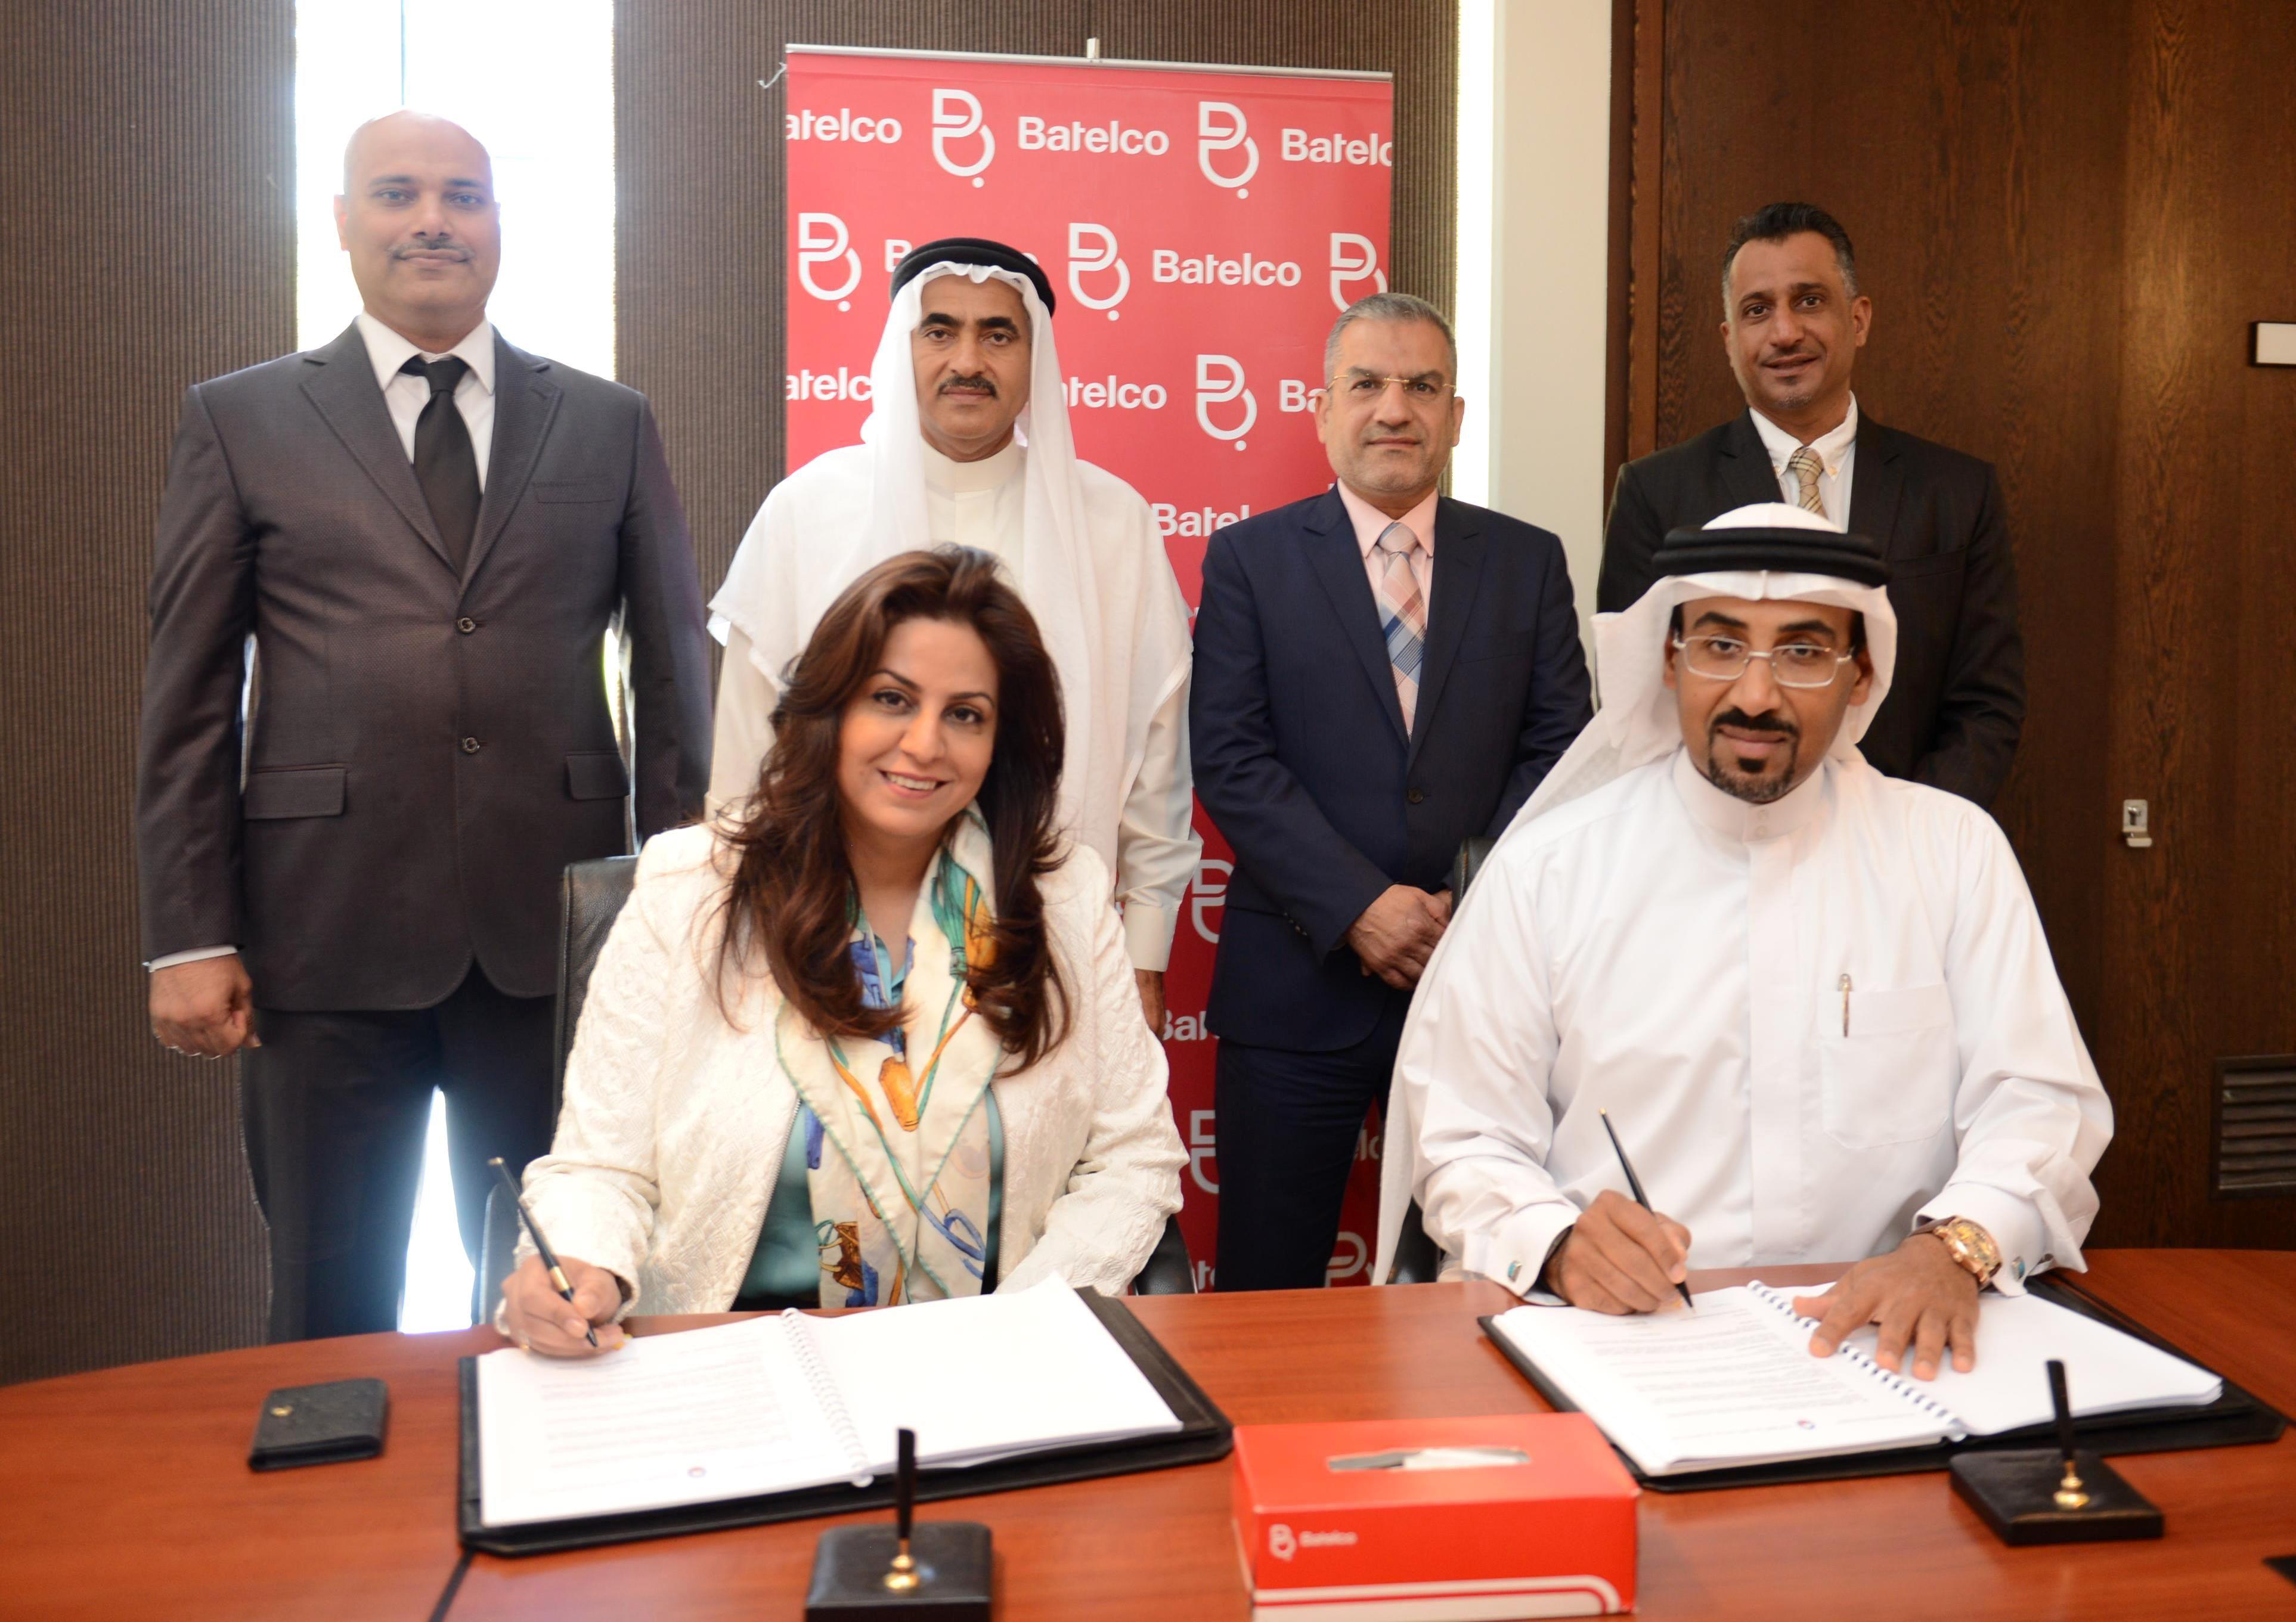 Batelco, Bahrain's leading digital solutions provider has announced